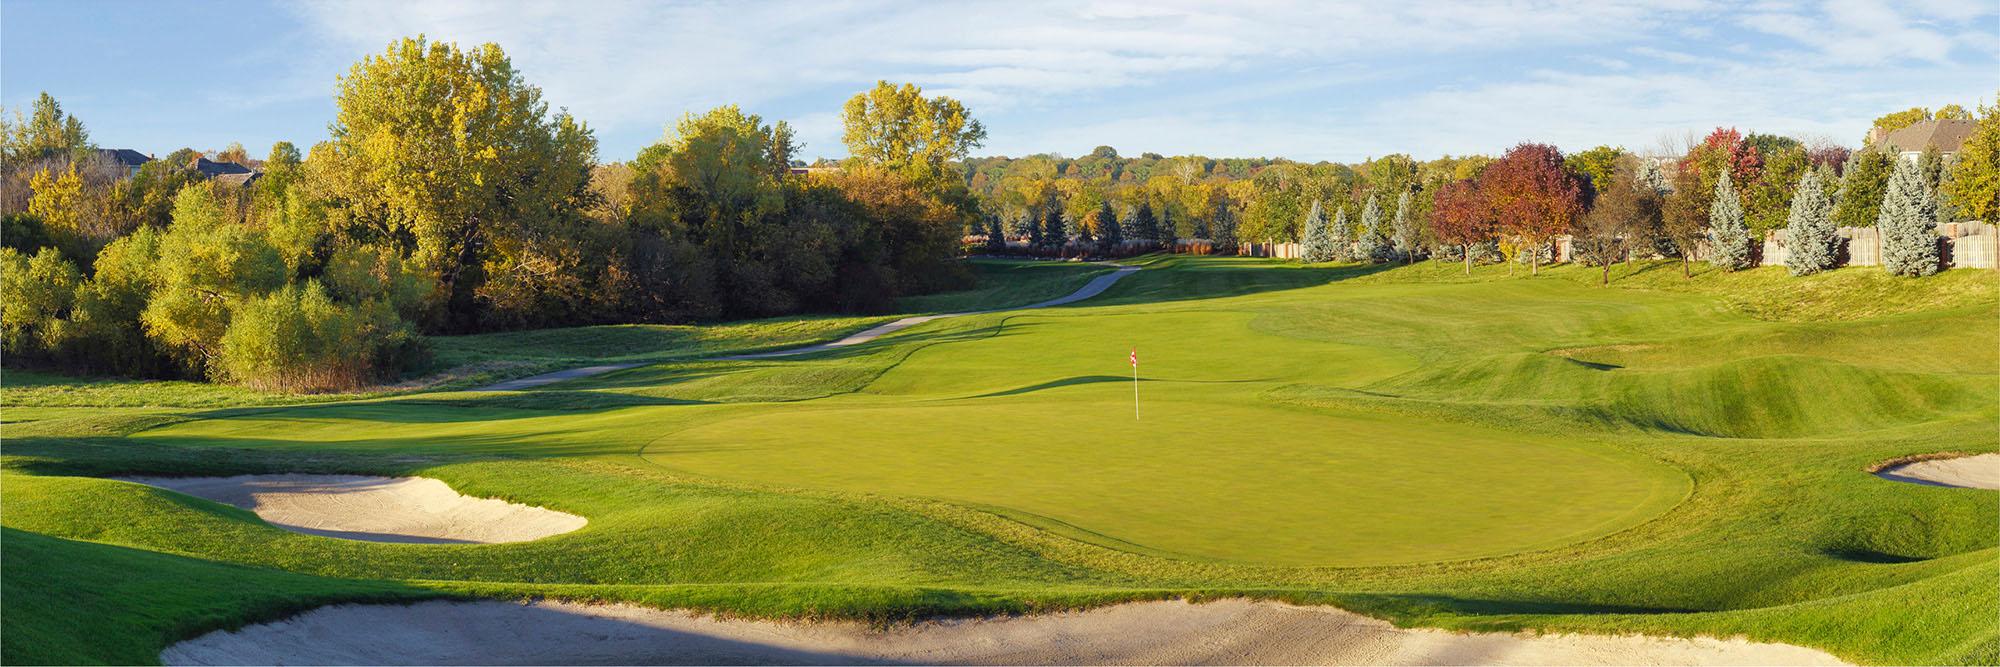 Golf Course Image - Champions Run No. 3